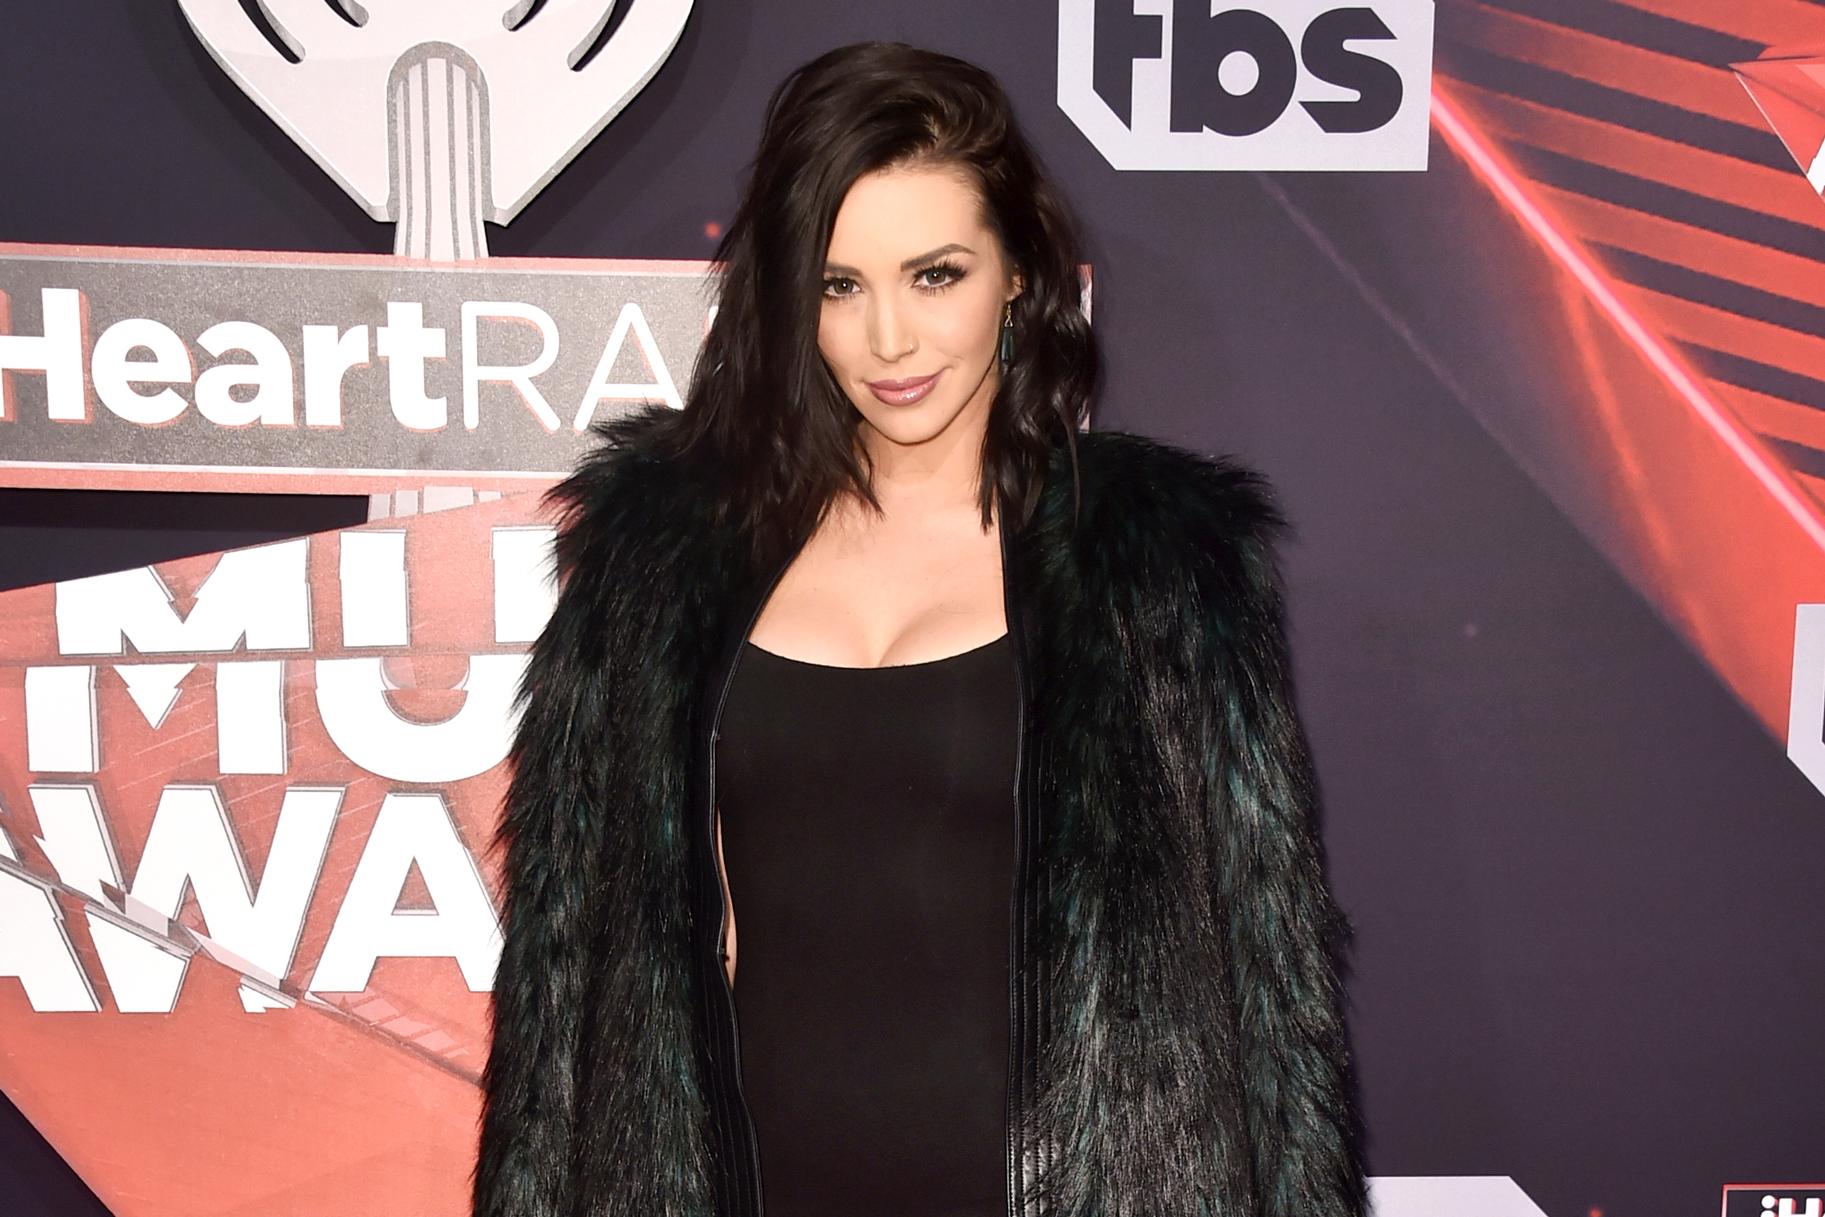 iHeartRadio Music Awards 2017 Red Carpet Photos of Vanderpump Rules